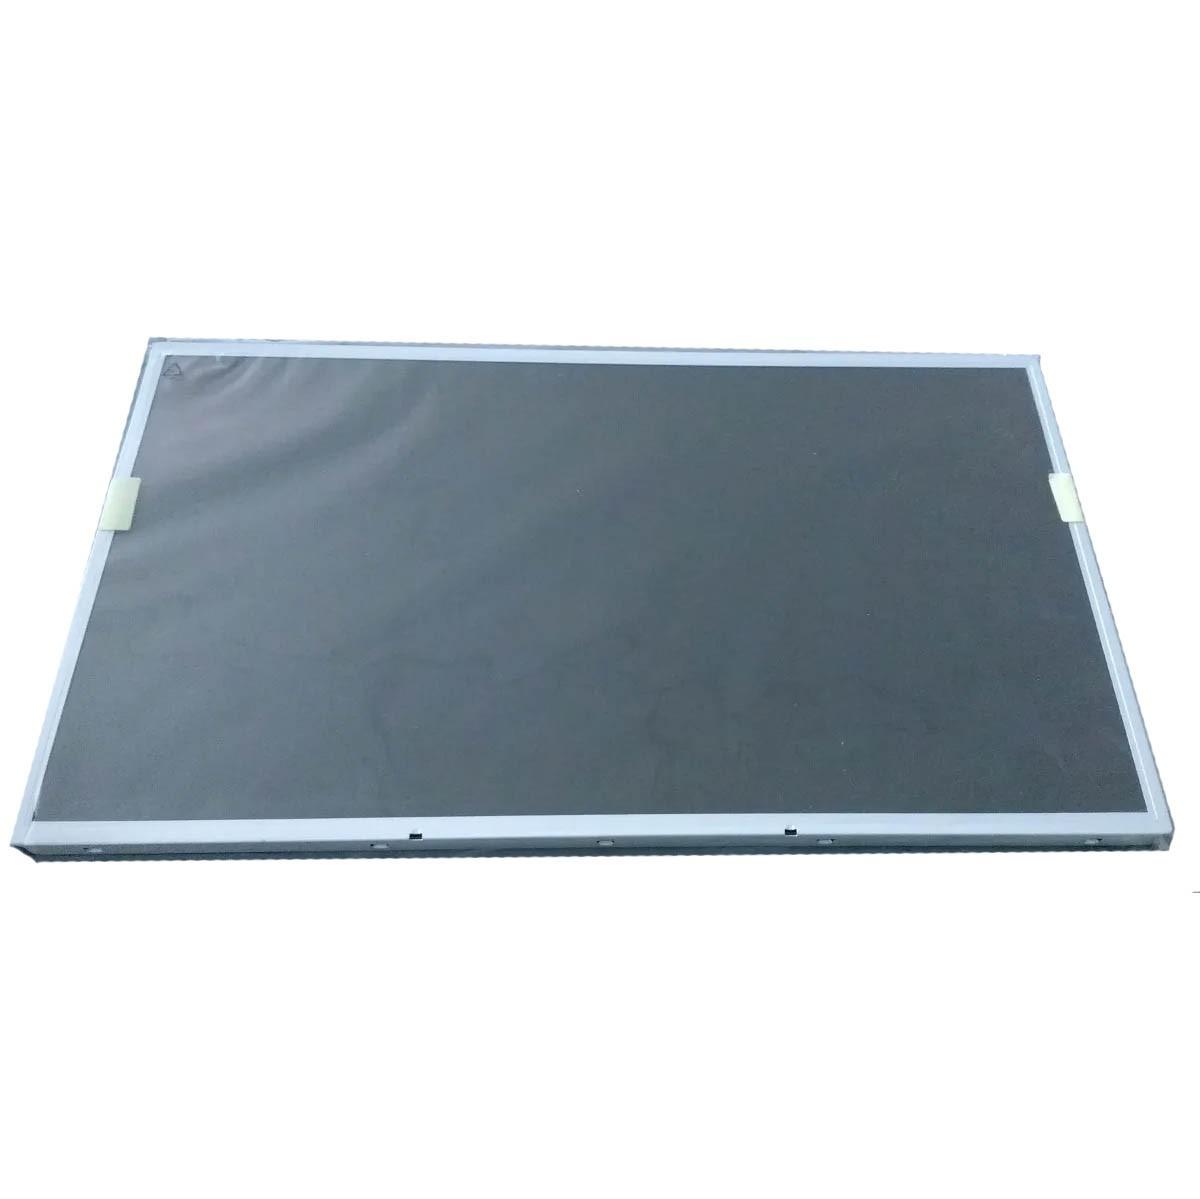 Tela Display LCD Monitor LG PN:LM200WD1 - Retirado